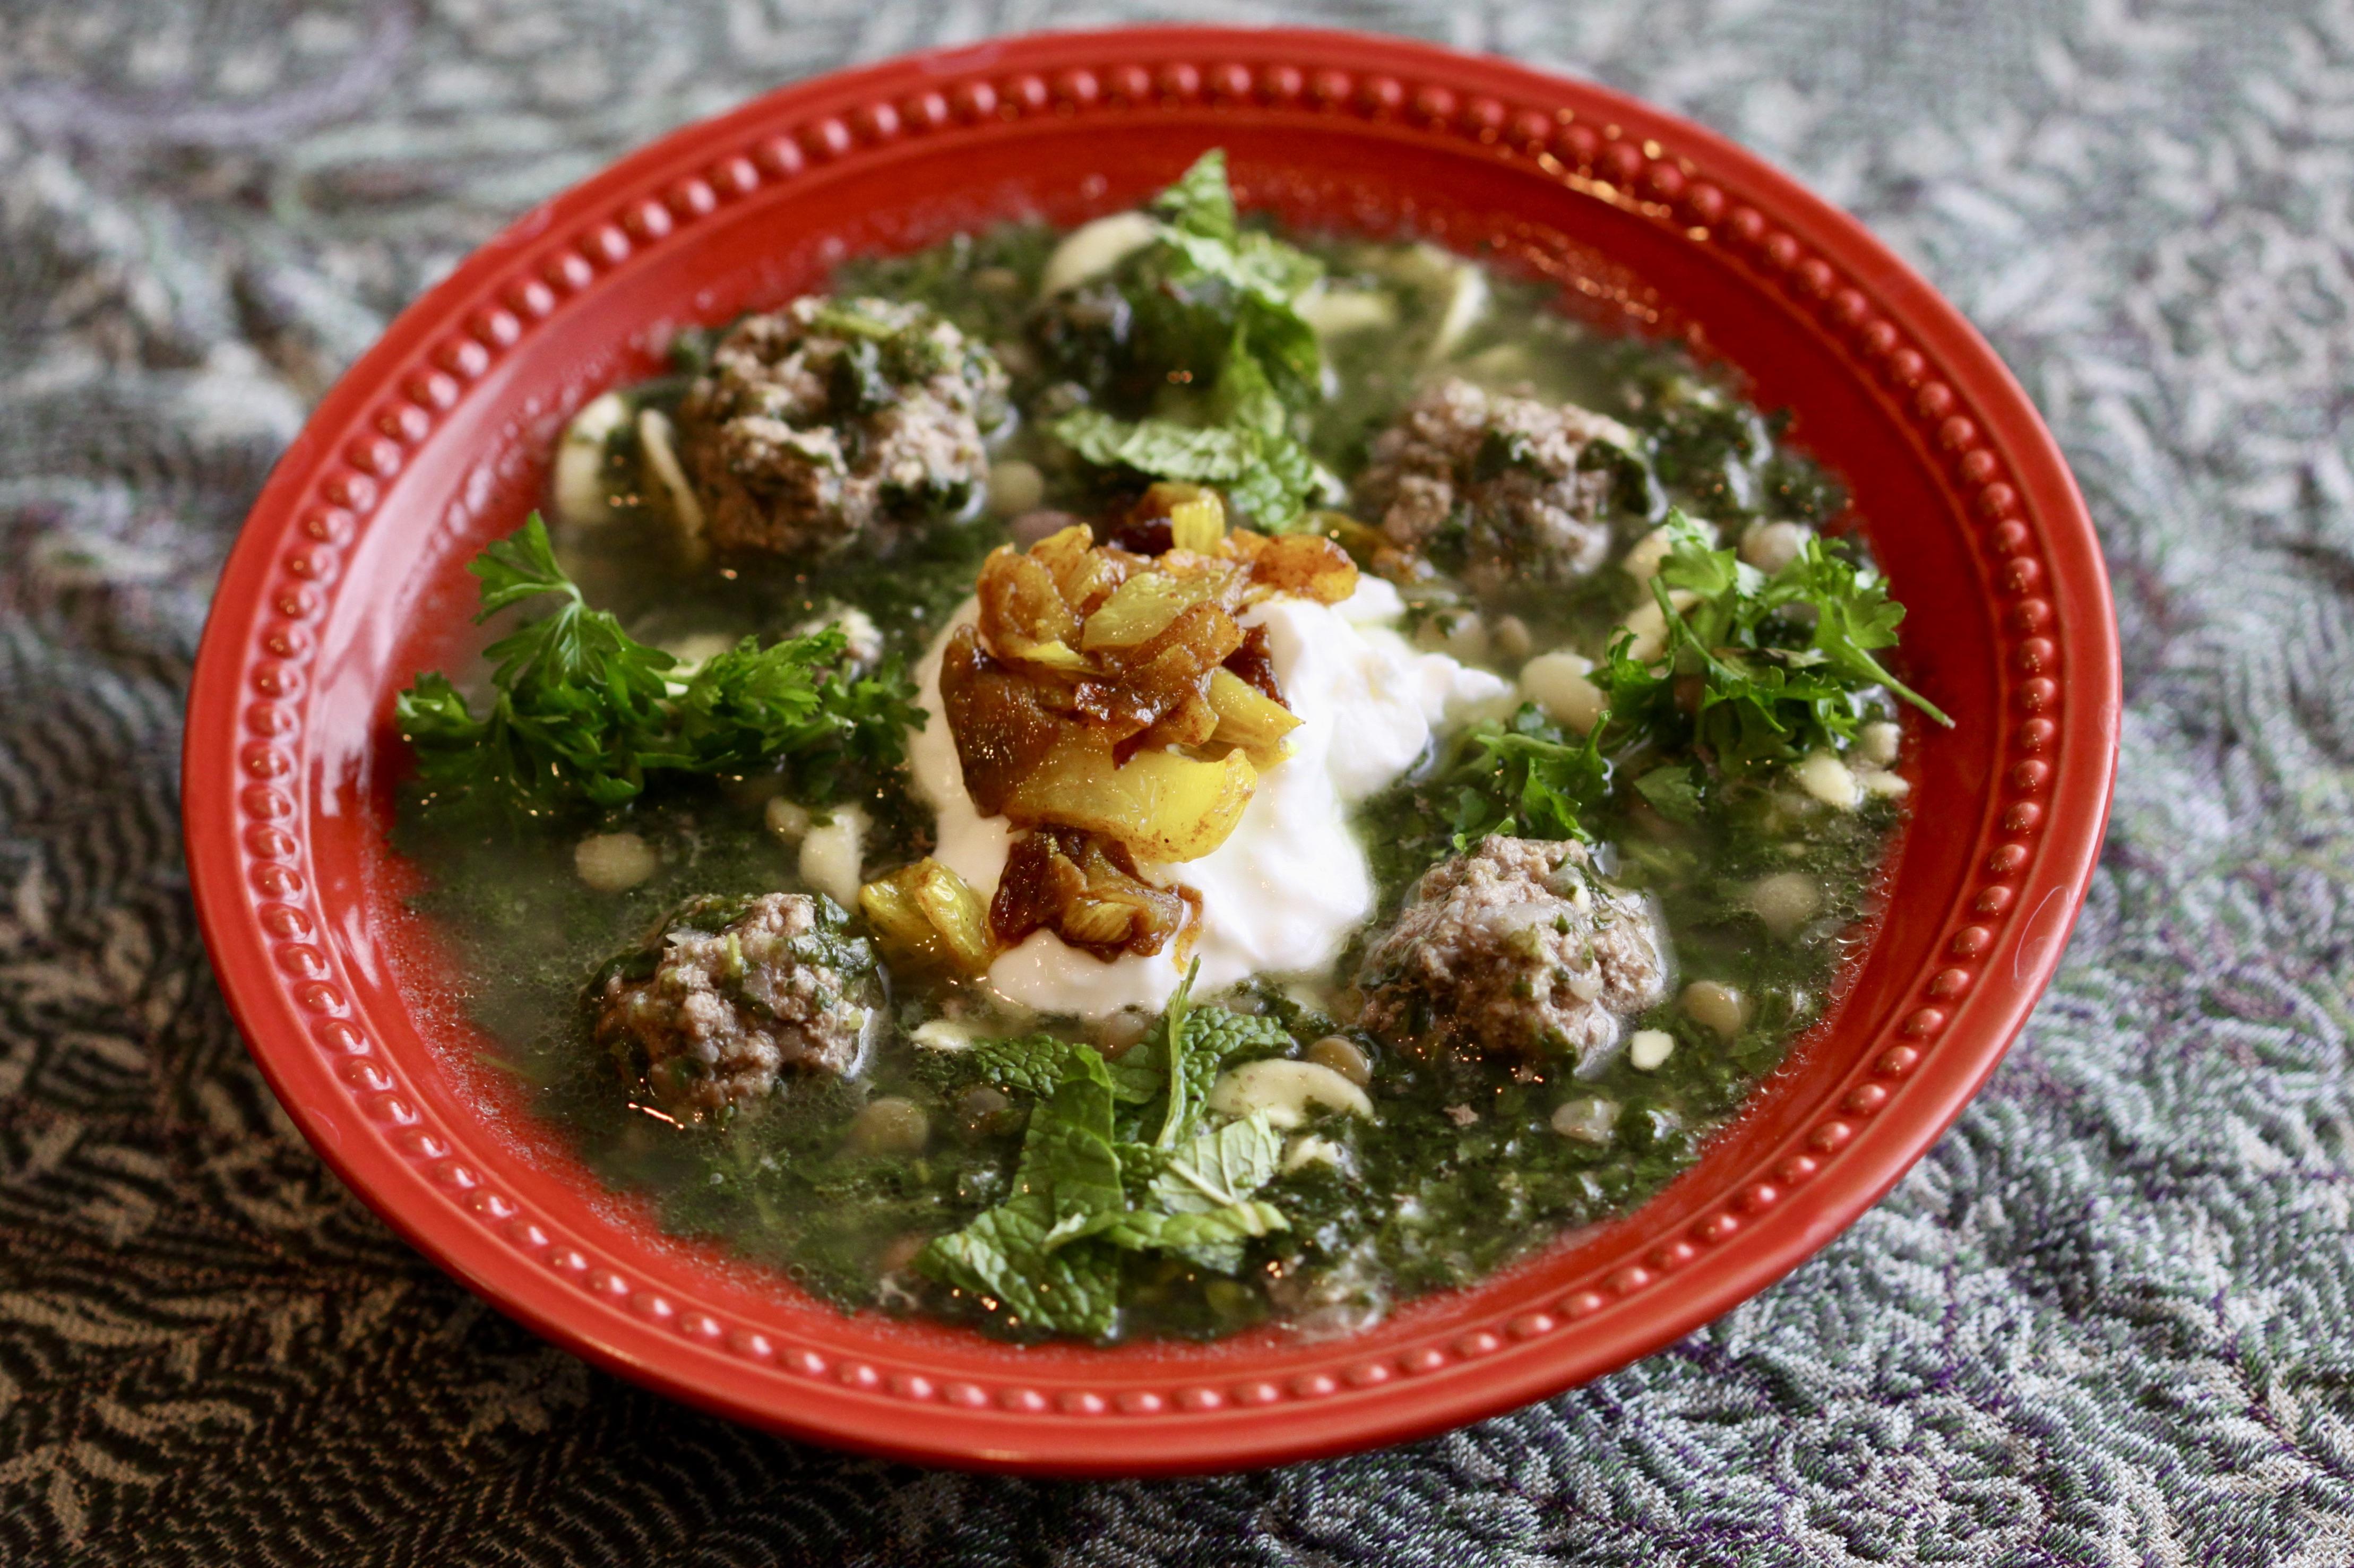 A bowl of ashe reshte (meatball soup)